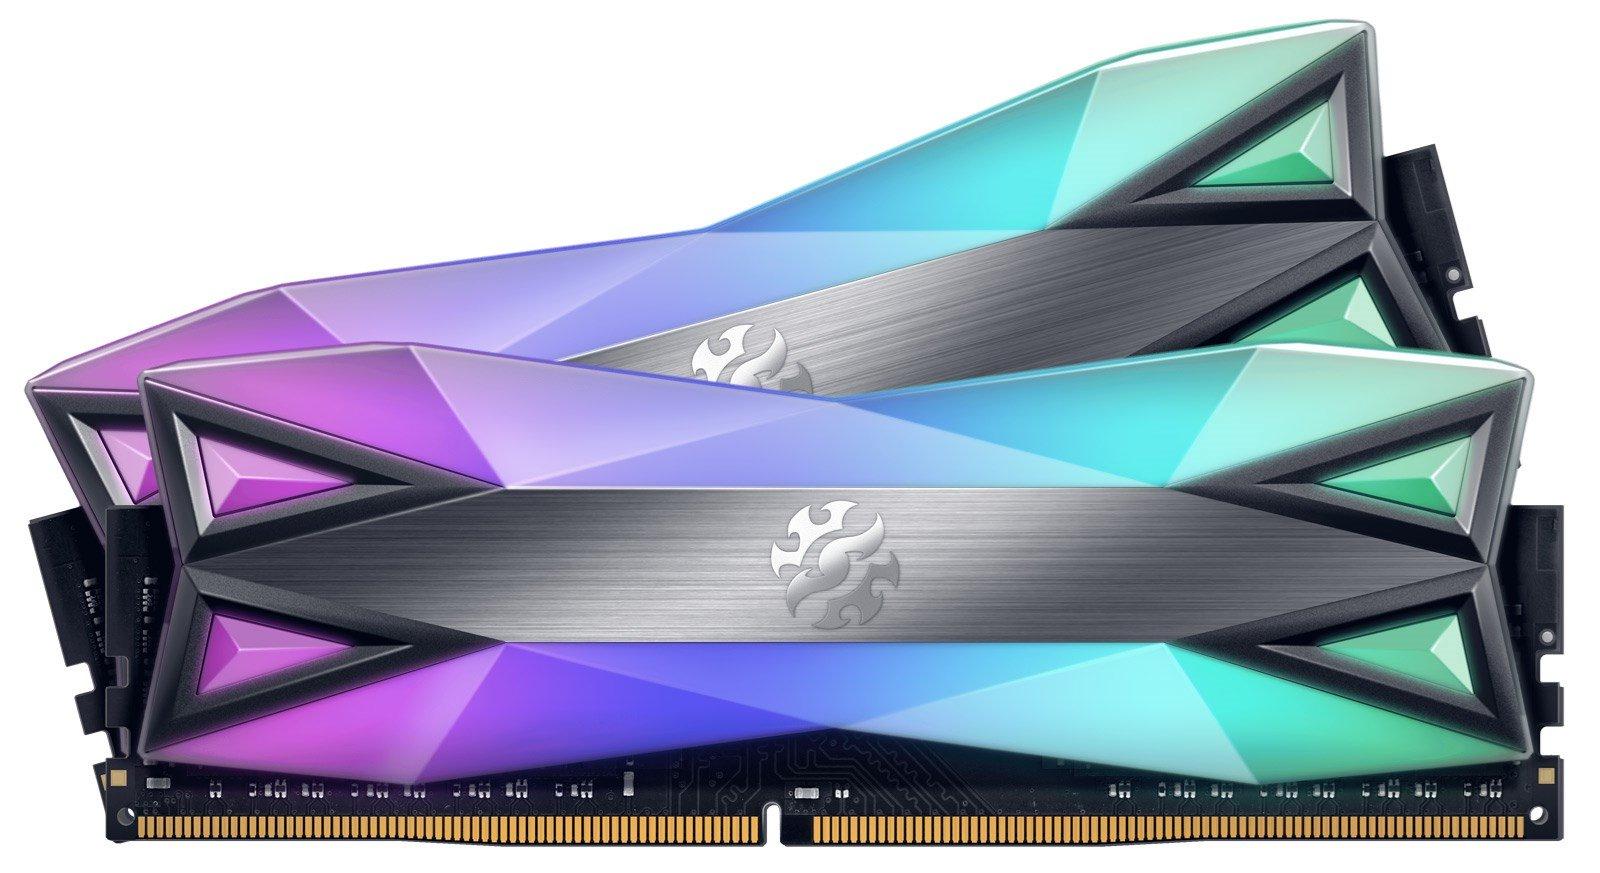 Adata XPG SPECTRIX D60G 16GB (2x 8GB) 3200MHz DDR4 RGB RAM -CL16- £51.77 Delivered @ CCLOnline